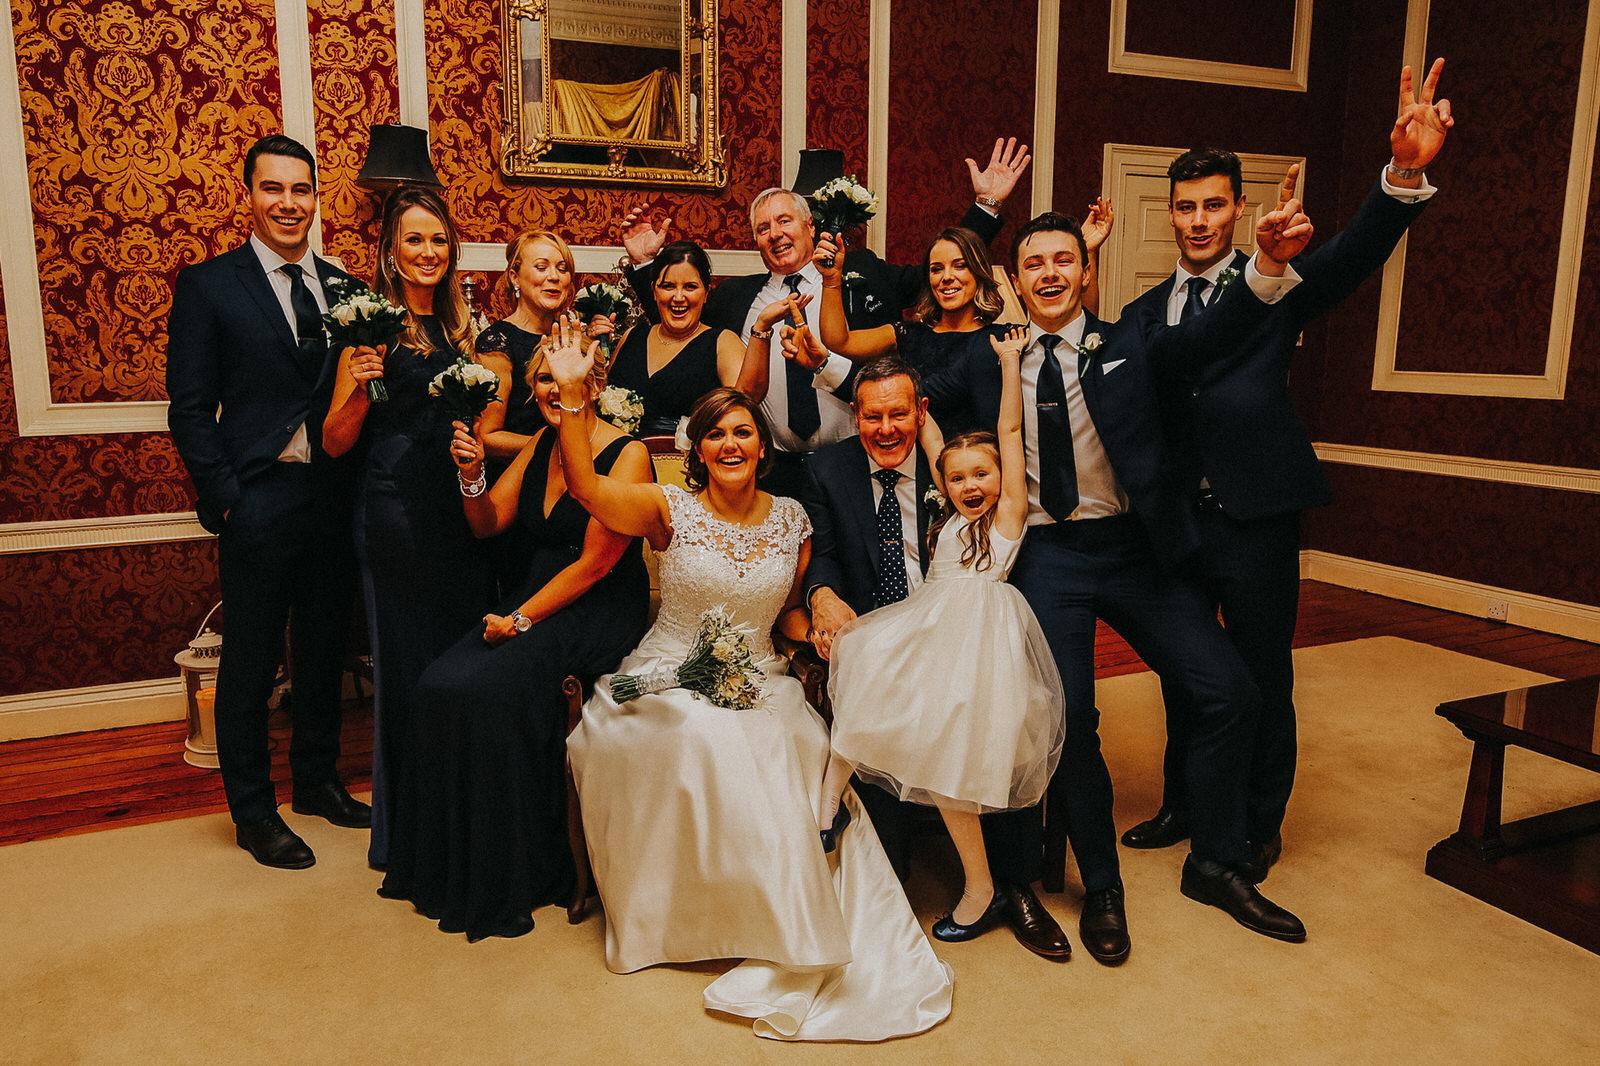 Roger_Kenny_wedding_photographer_Tankardstown_634.jpg